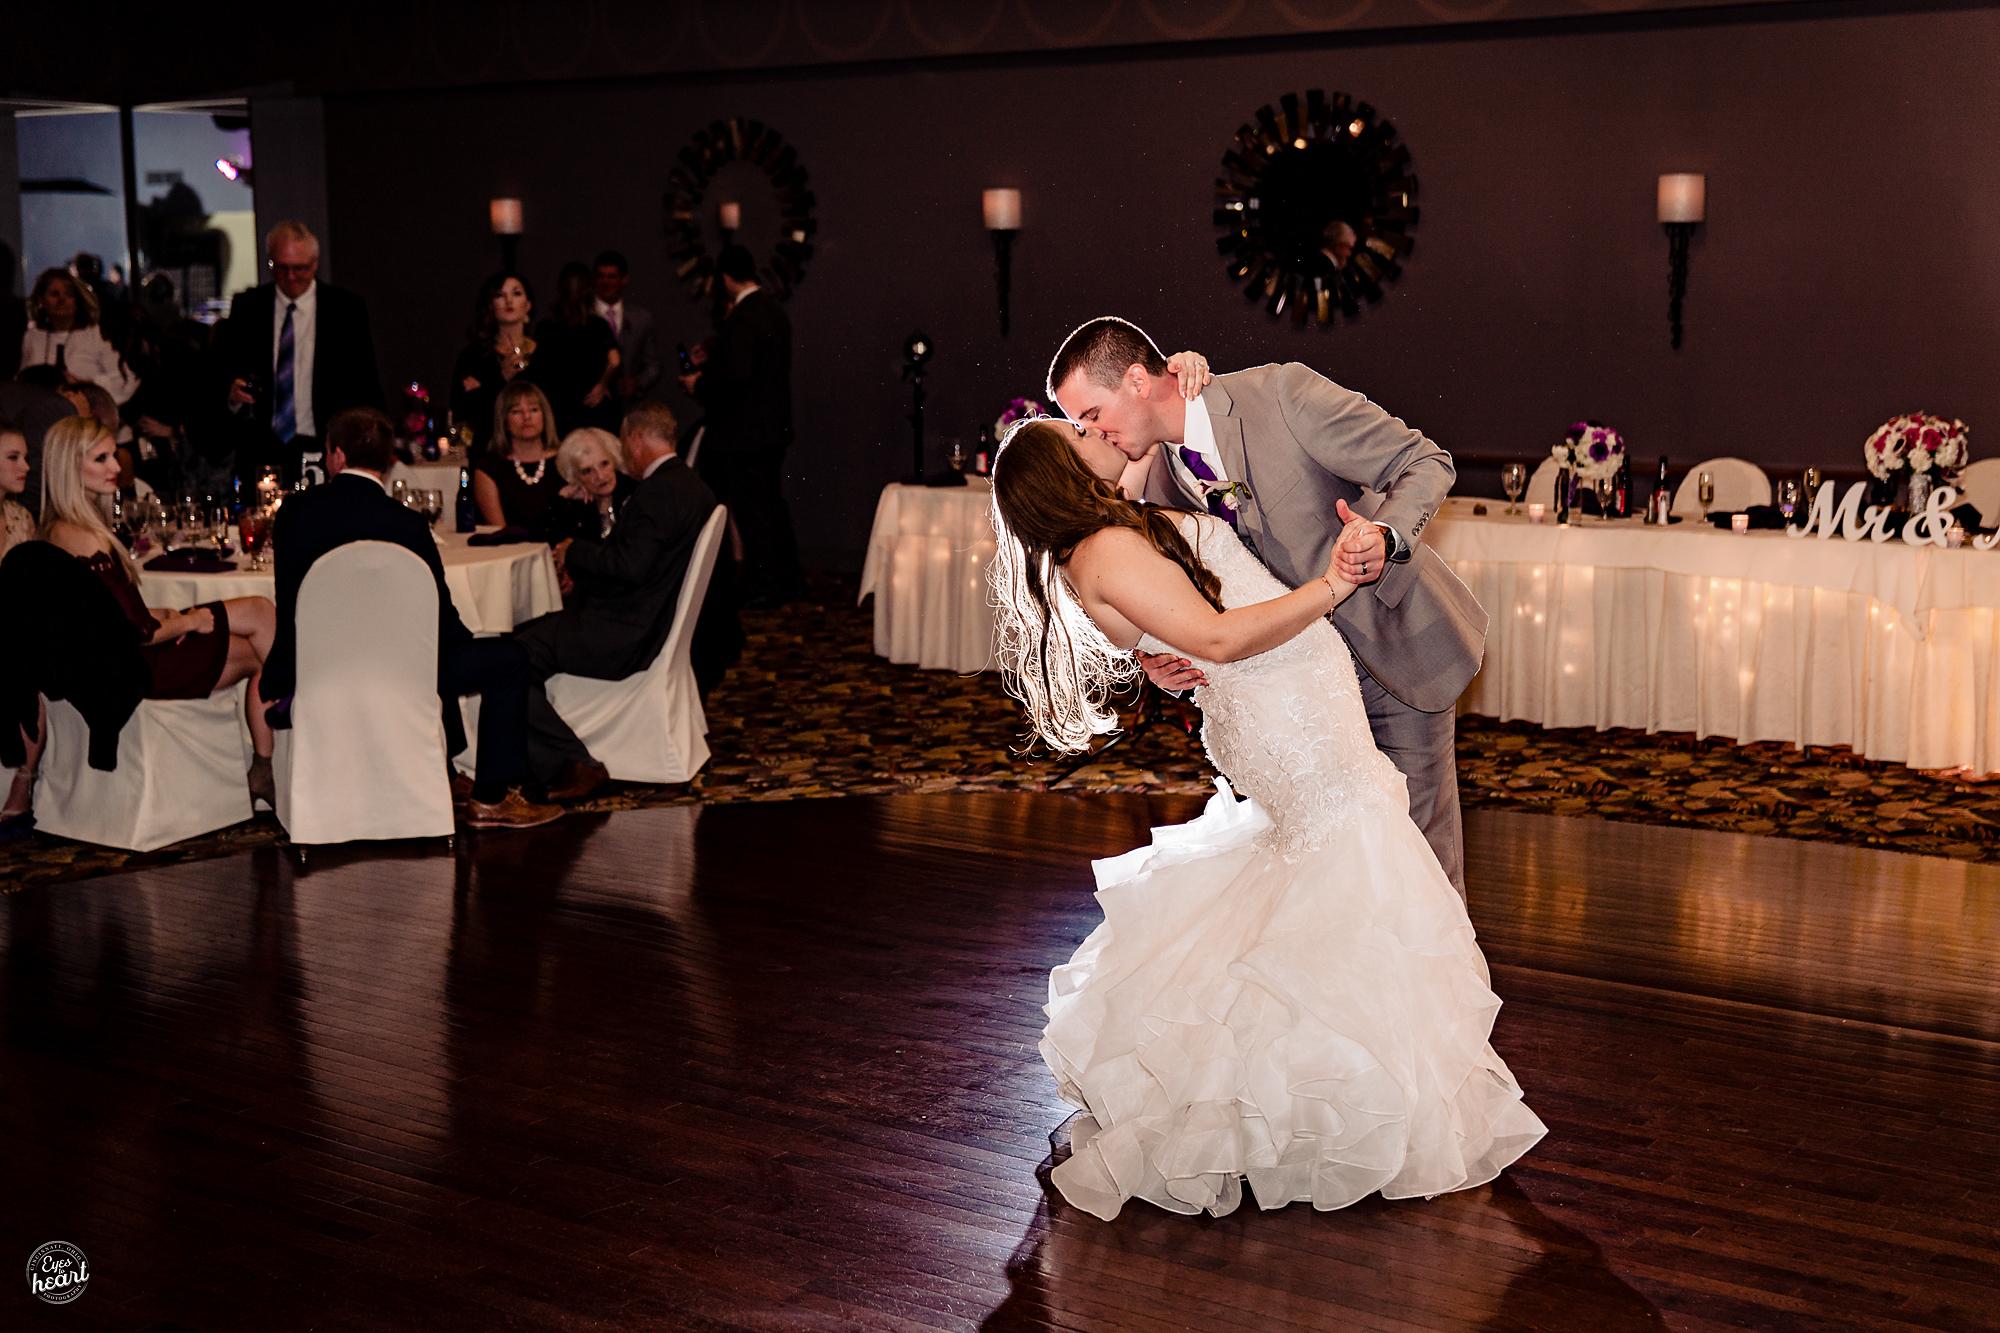 The-Pinnacle-Ballroom-Covington-KY-Wedding-Photography-19.jpg